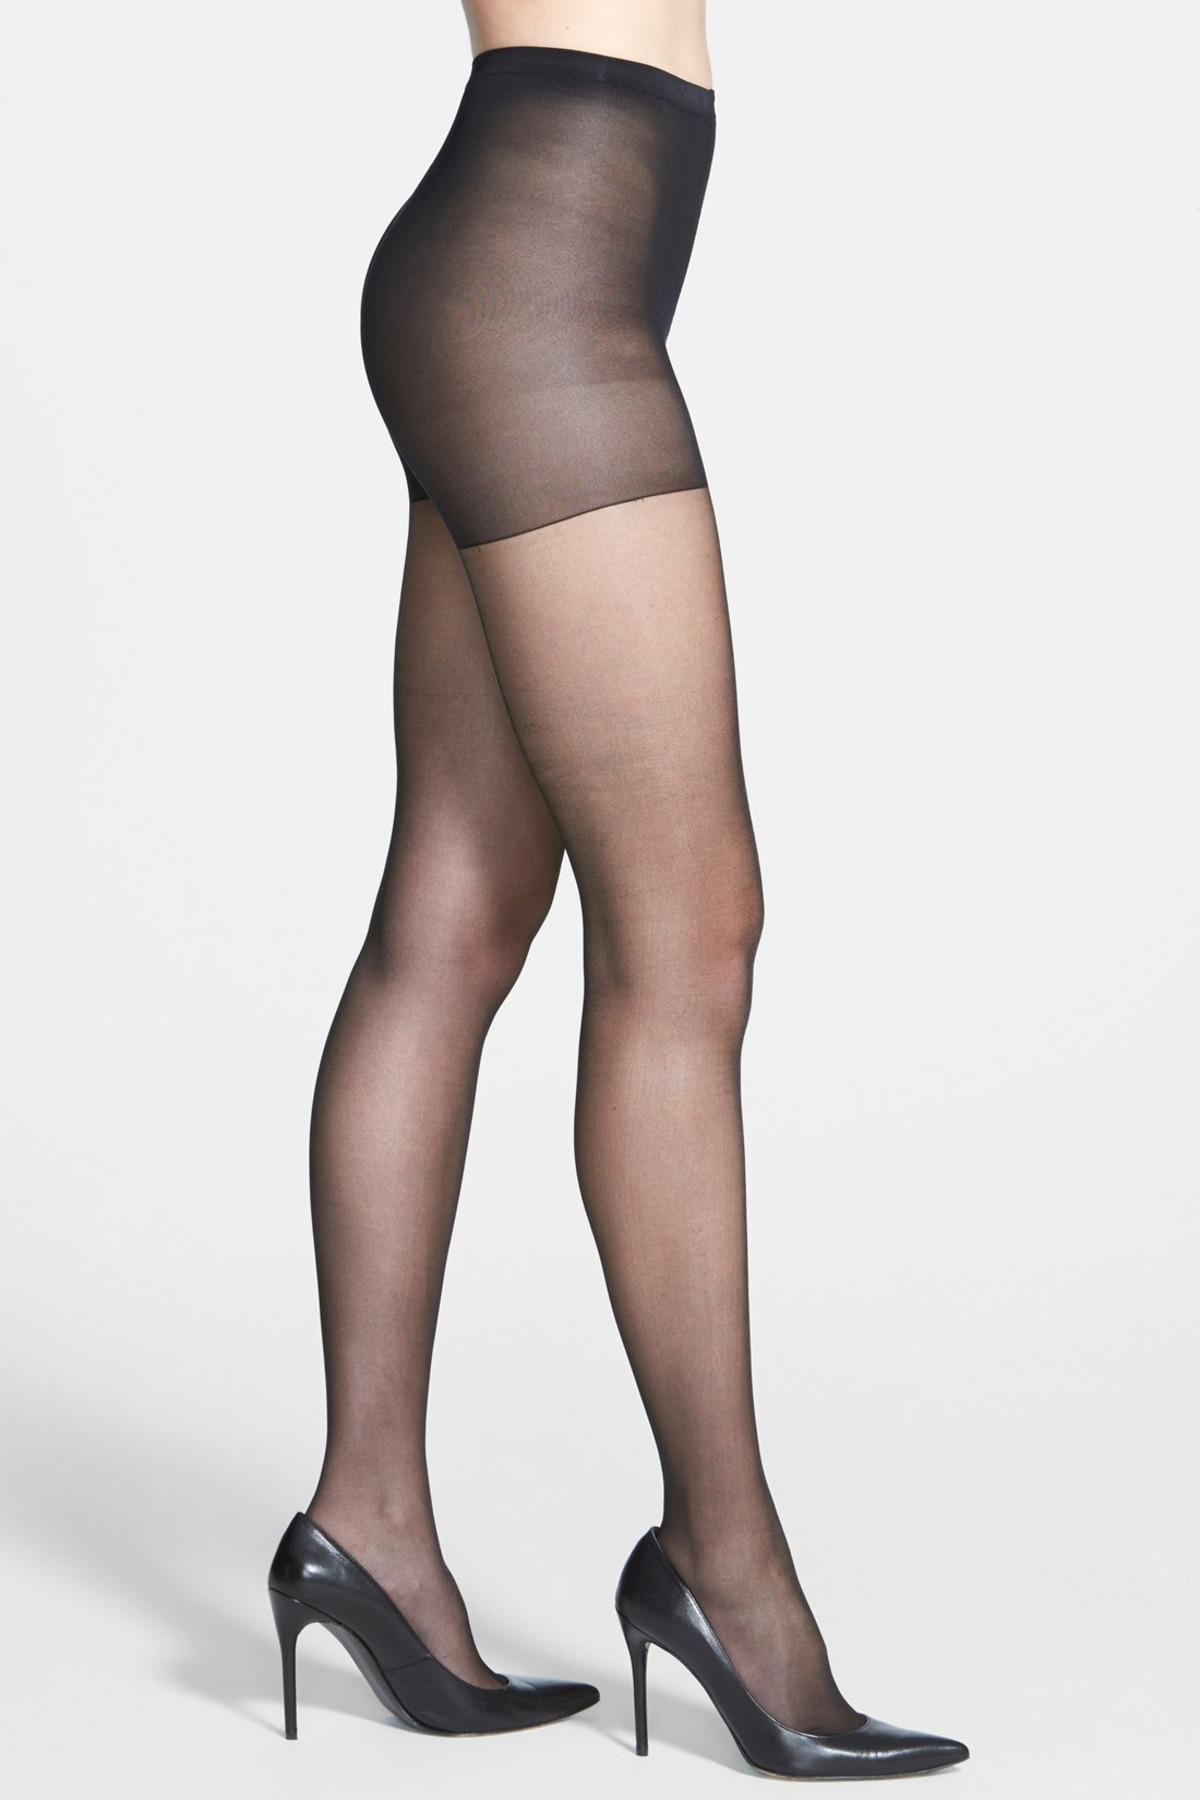 144ce985d4d1e Calvin Klein Shimmer Sheer Control Top Pantyhose in Black - Lyst